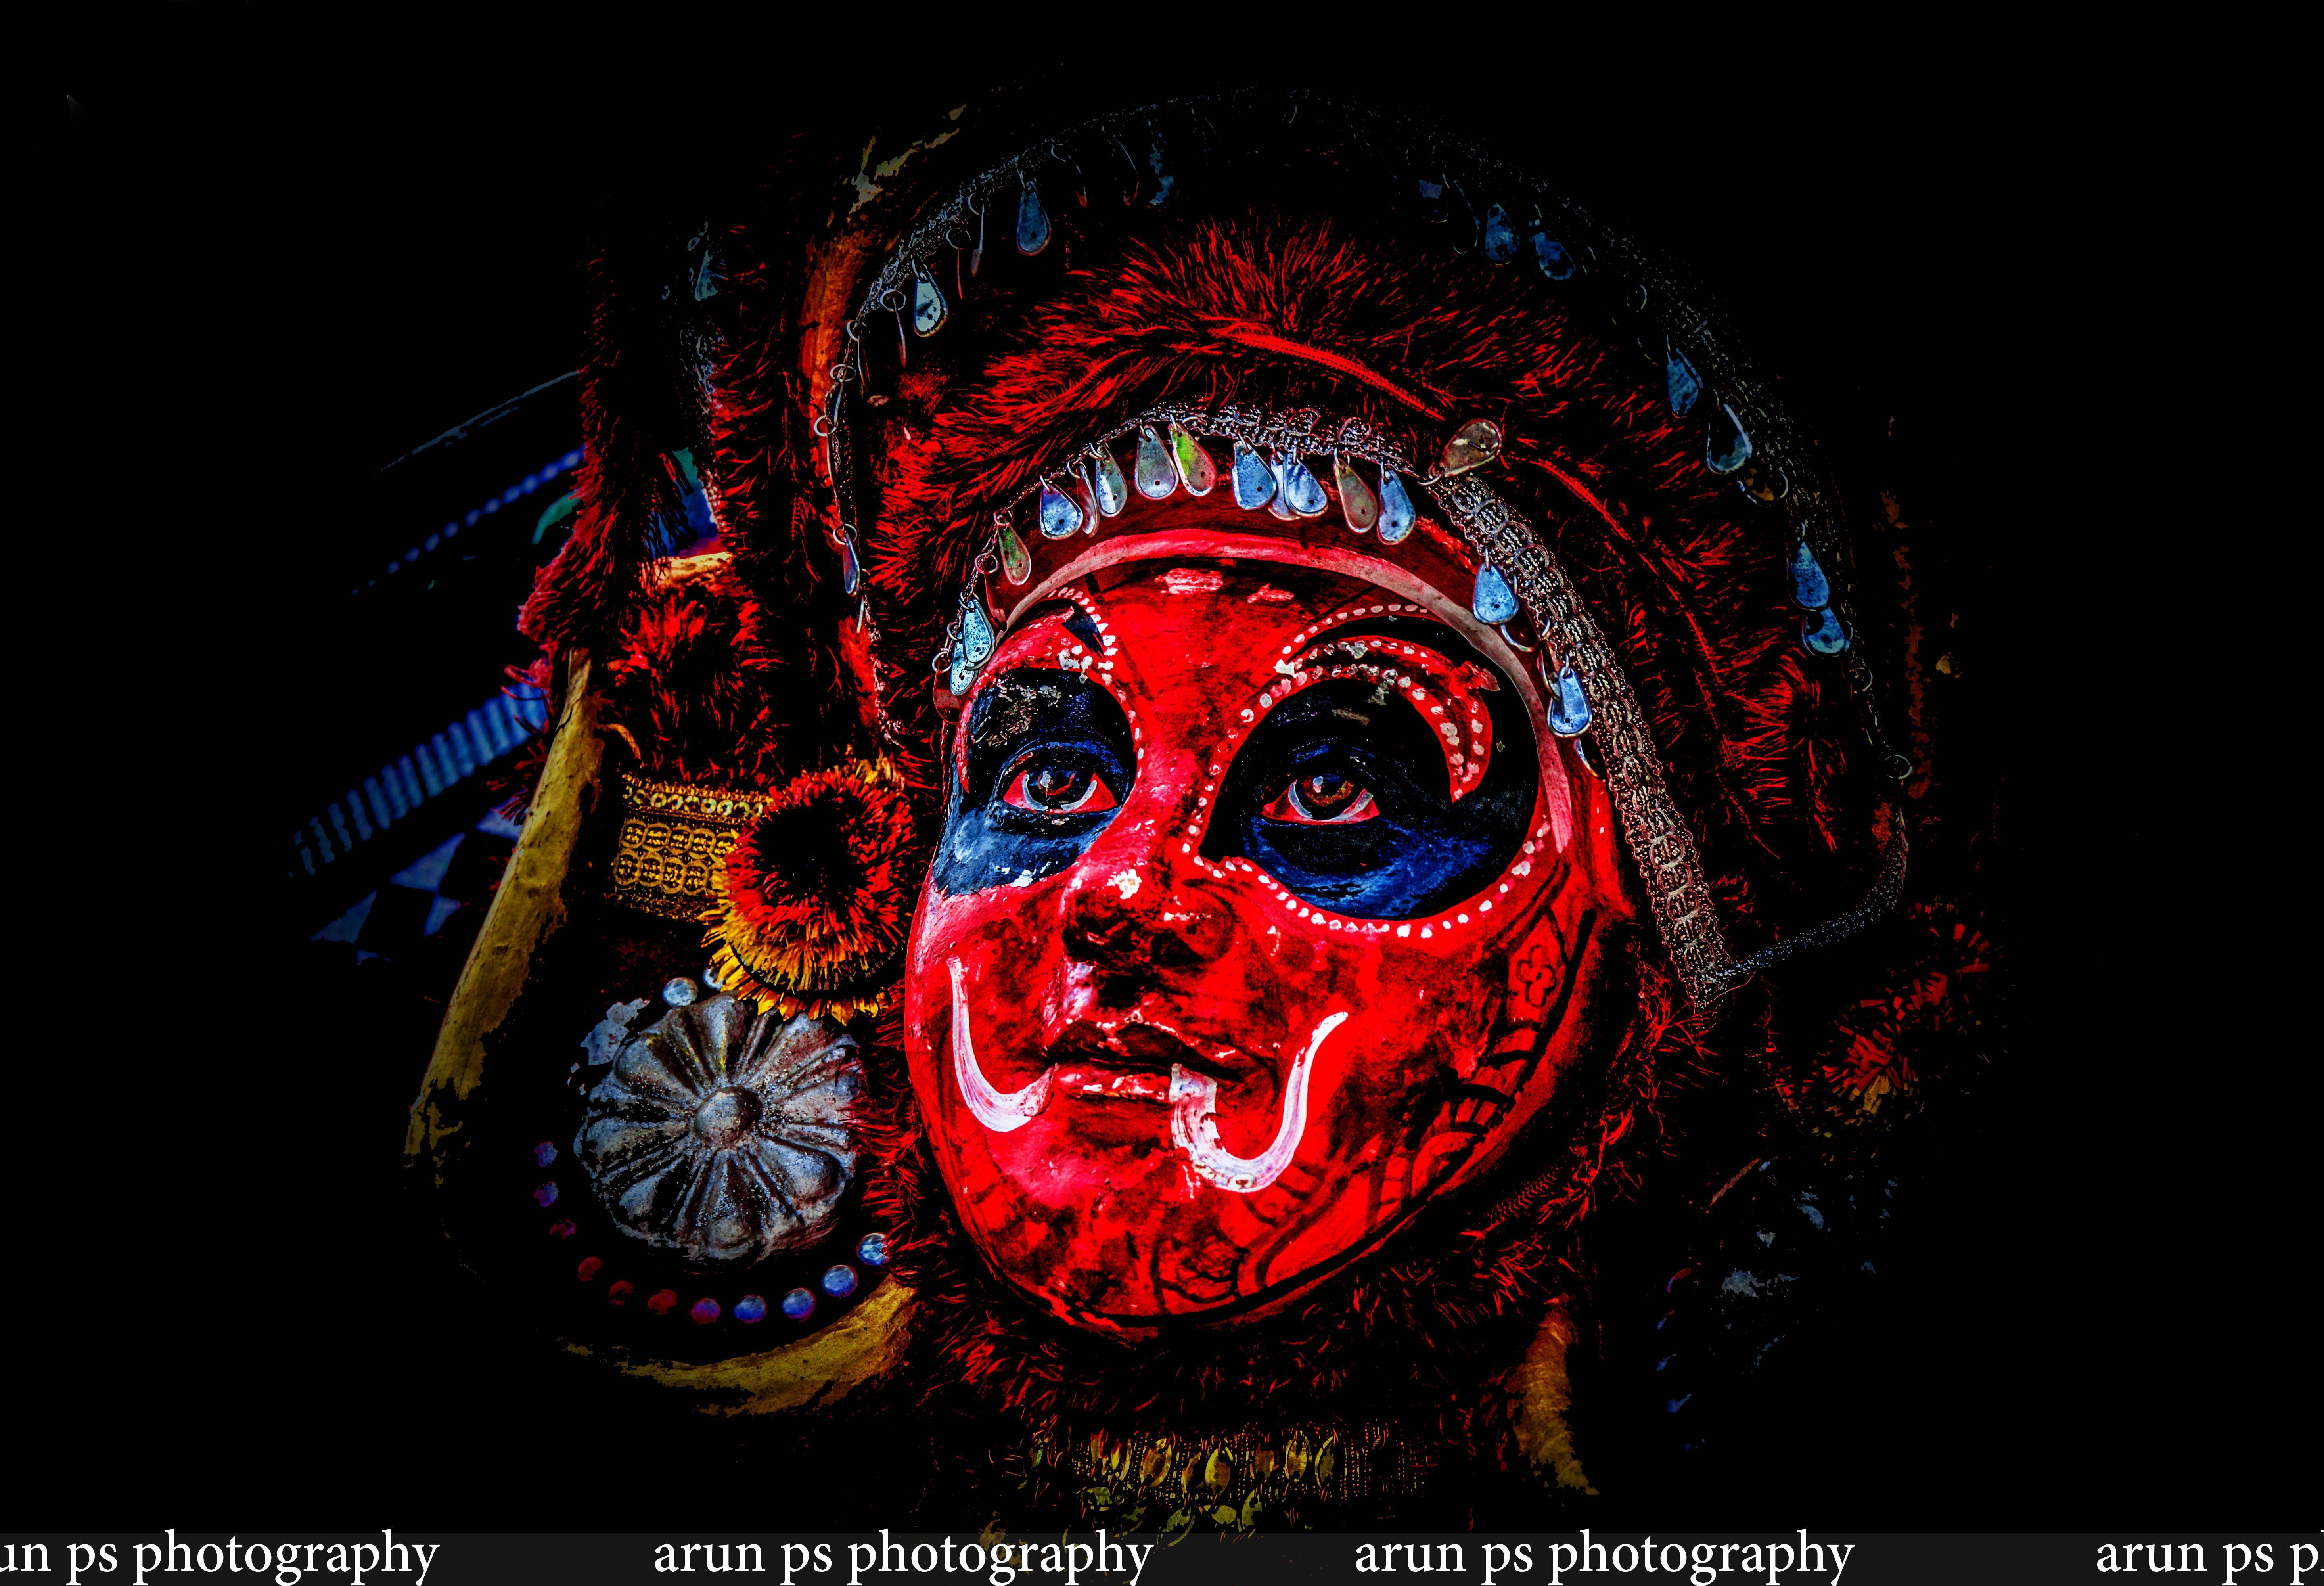 Theyyam Art Photography Hd Wallpaper Kerala Mural Art Culture Art Abstract Art Painting